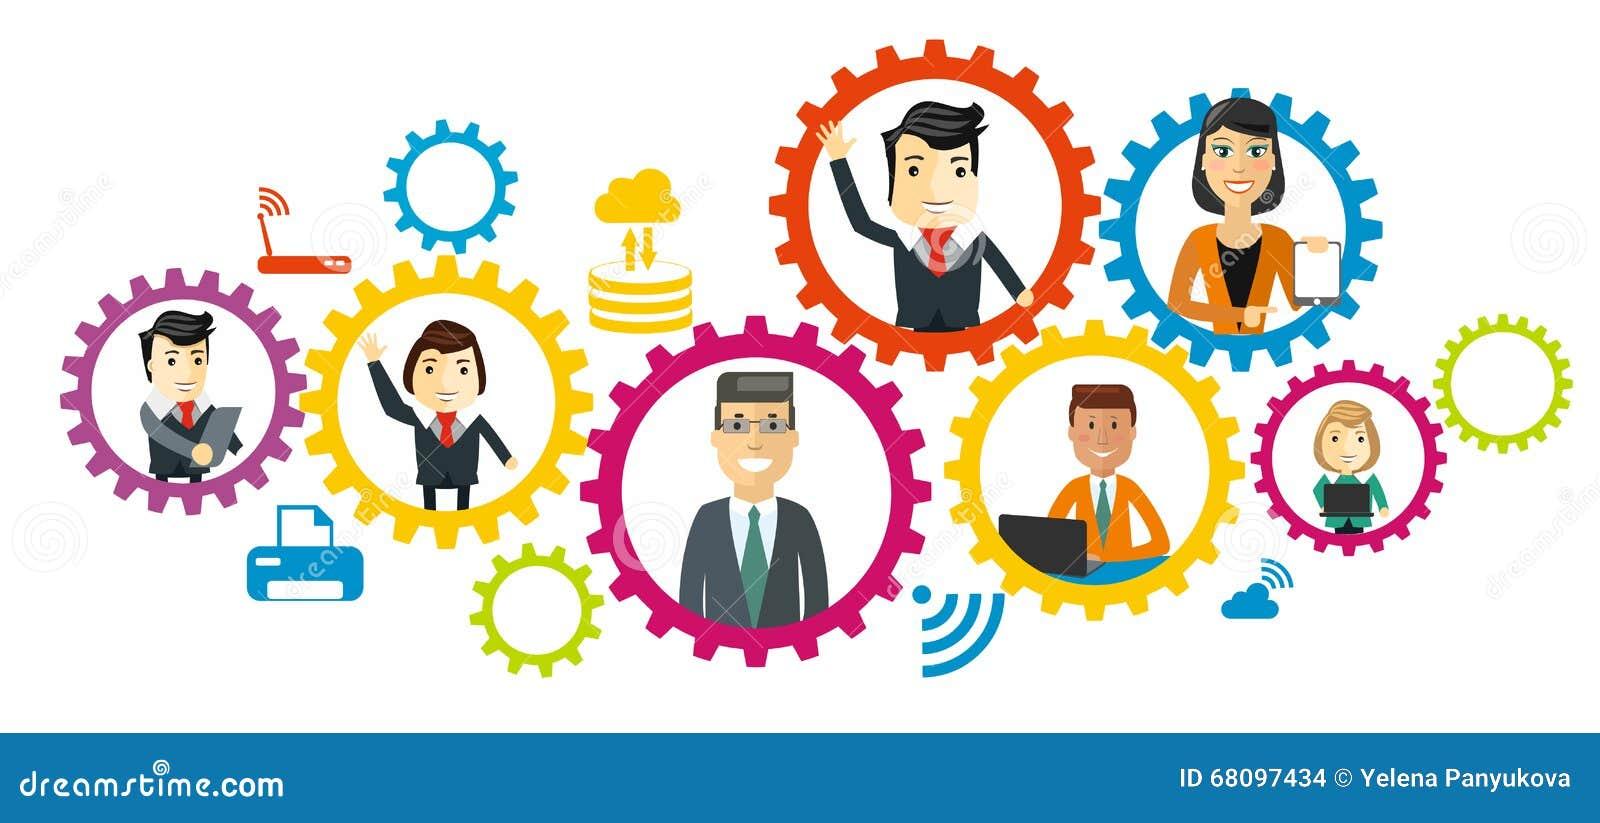 Business team cartoon characters cartoon vector cartoondealer com - Business Team Cartoon Characters Cartoon Vector Cartoondealer Com 67778951